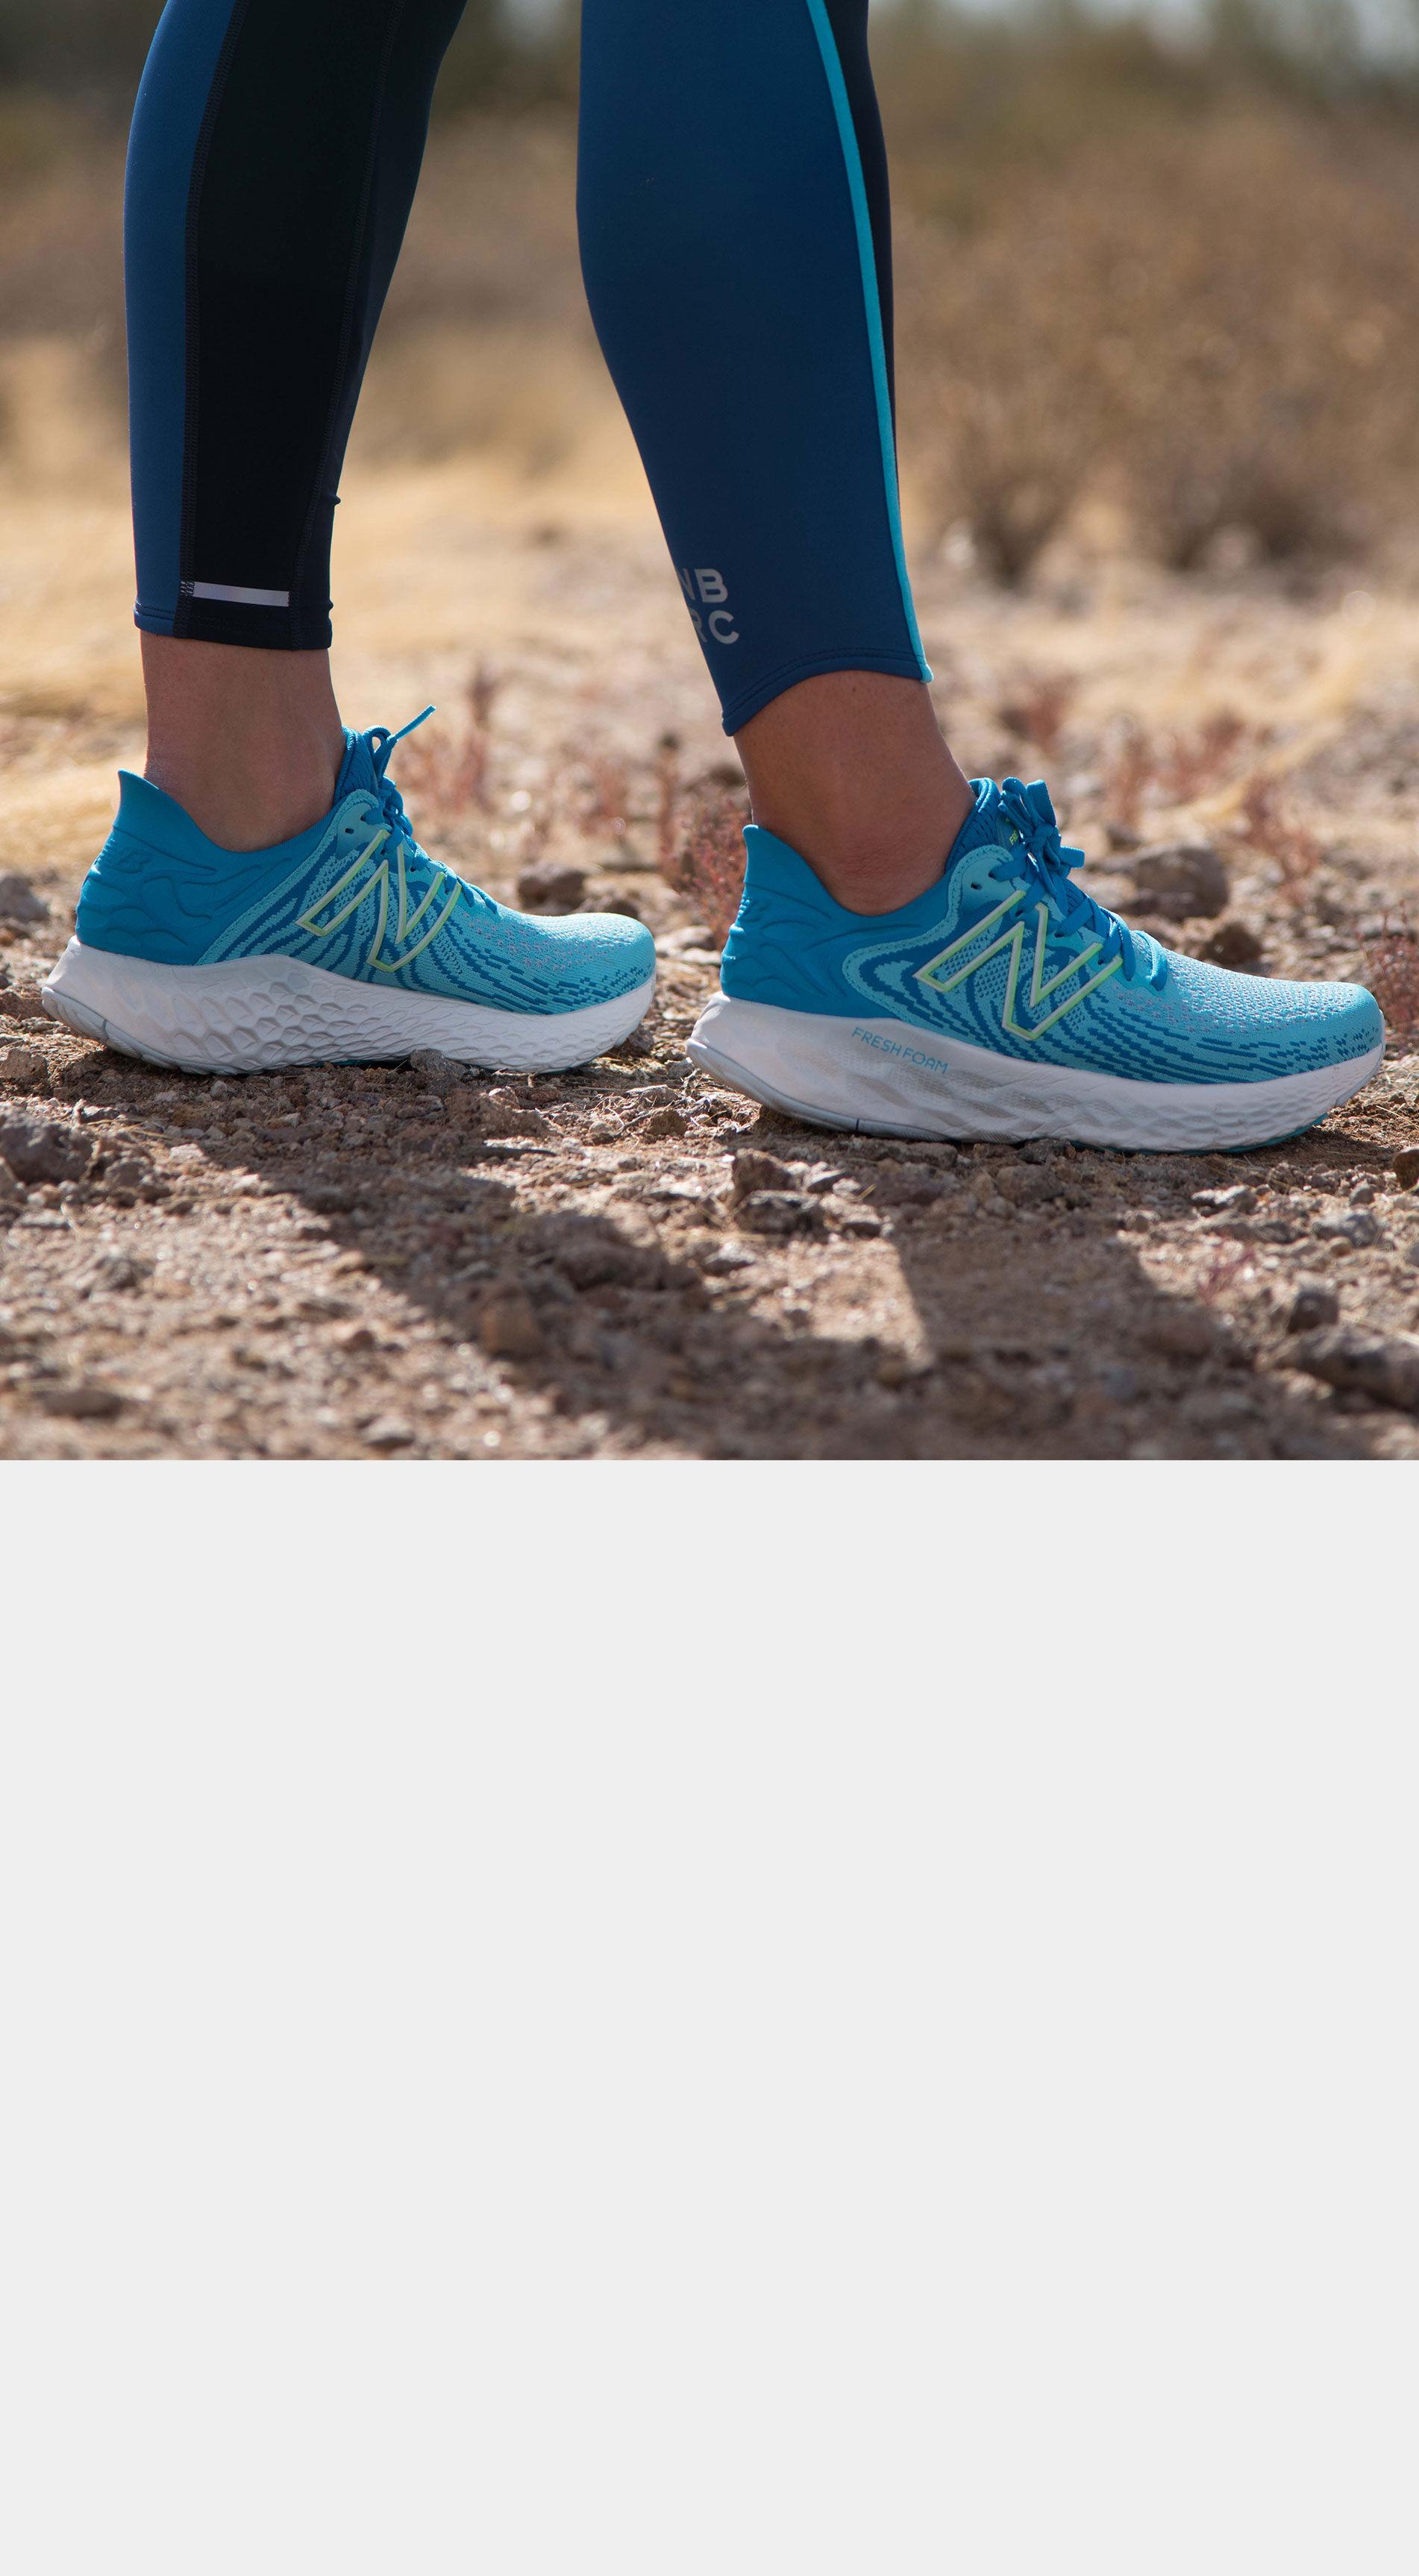 Chaussures de course Femme - New Balance